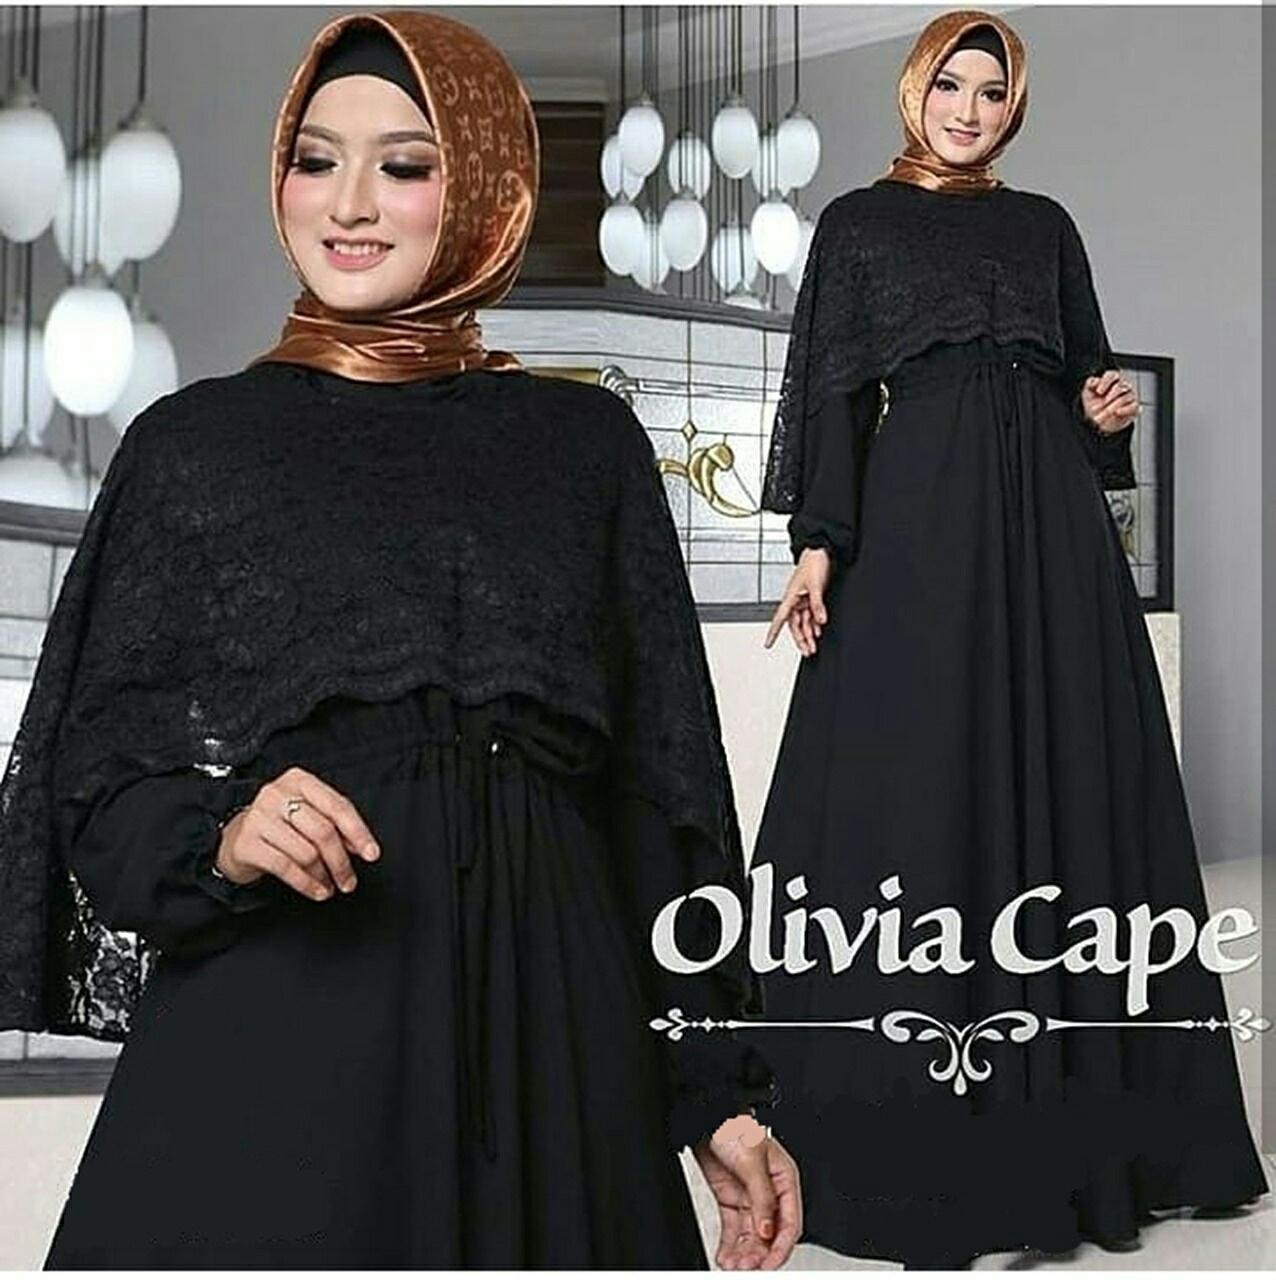 Kedai_baju Gamis Ori / Baju Lebaran / Pakaian Muslim Gamis Hitam Osaka - IA